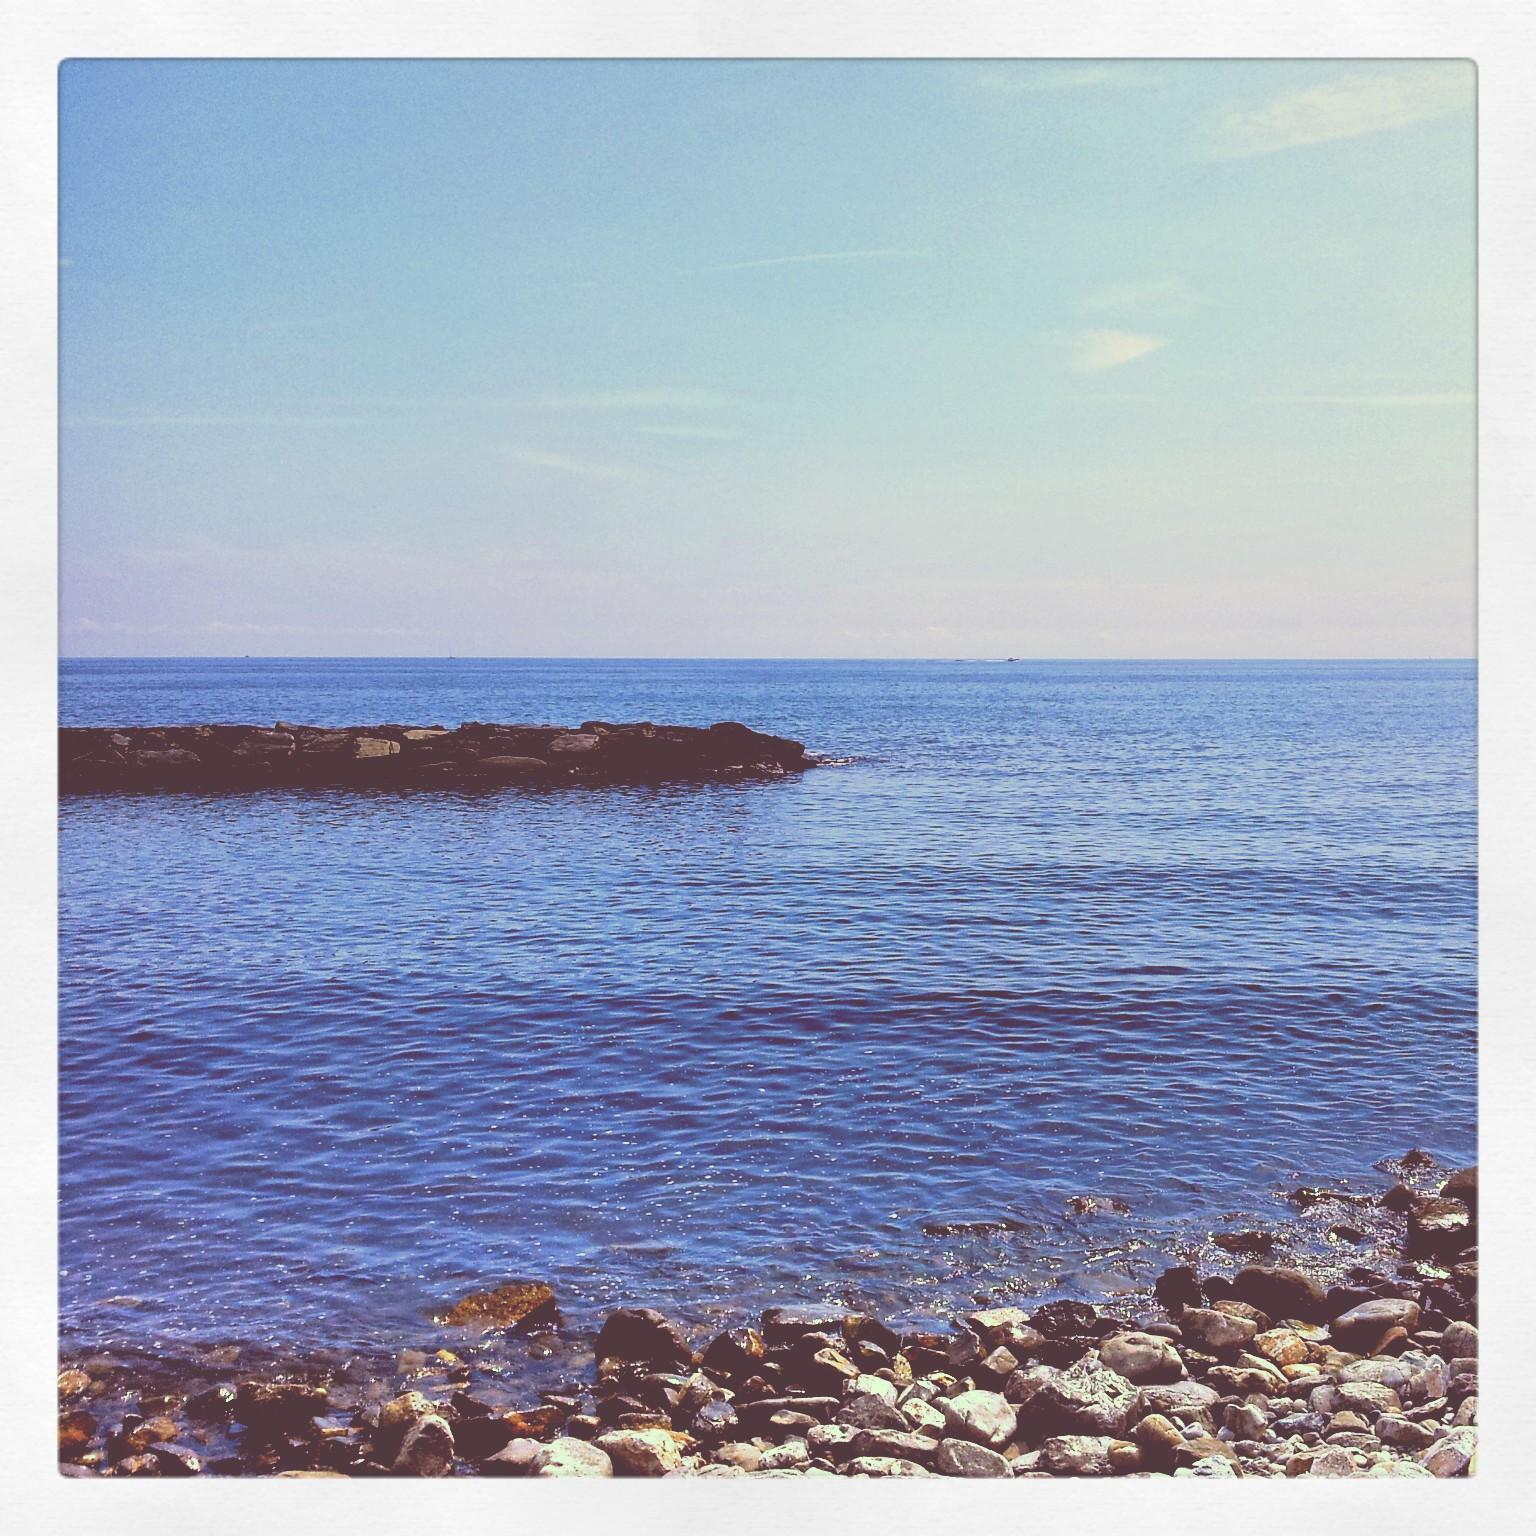 blog torino socialmedia mare vacanze